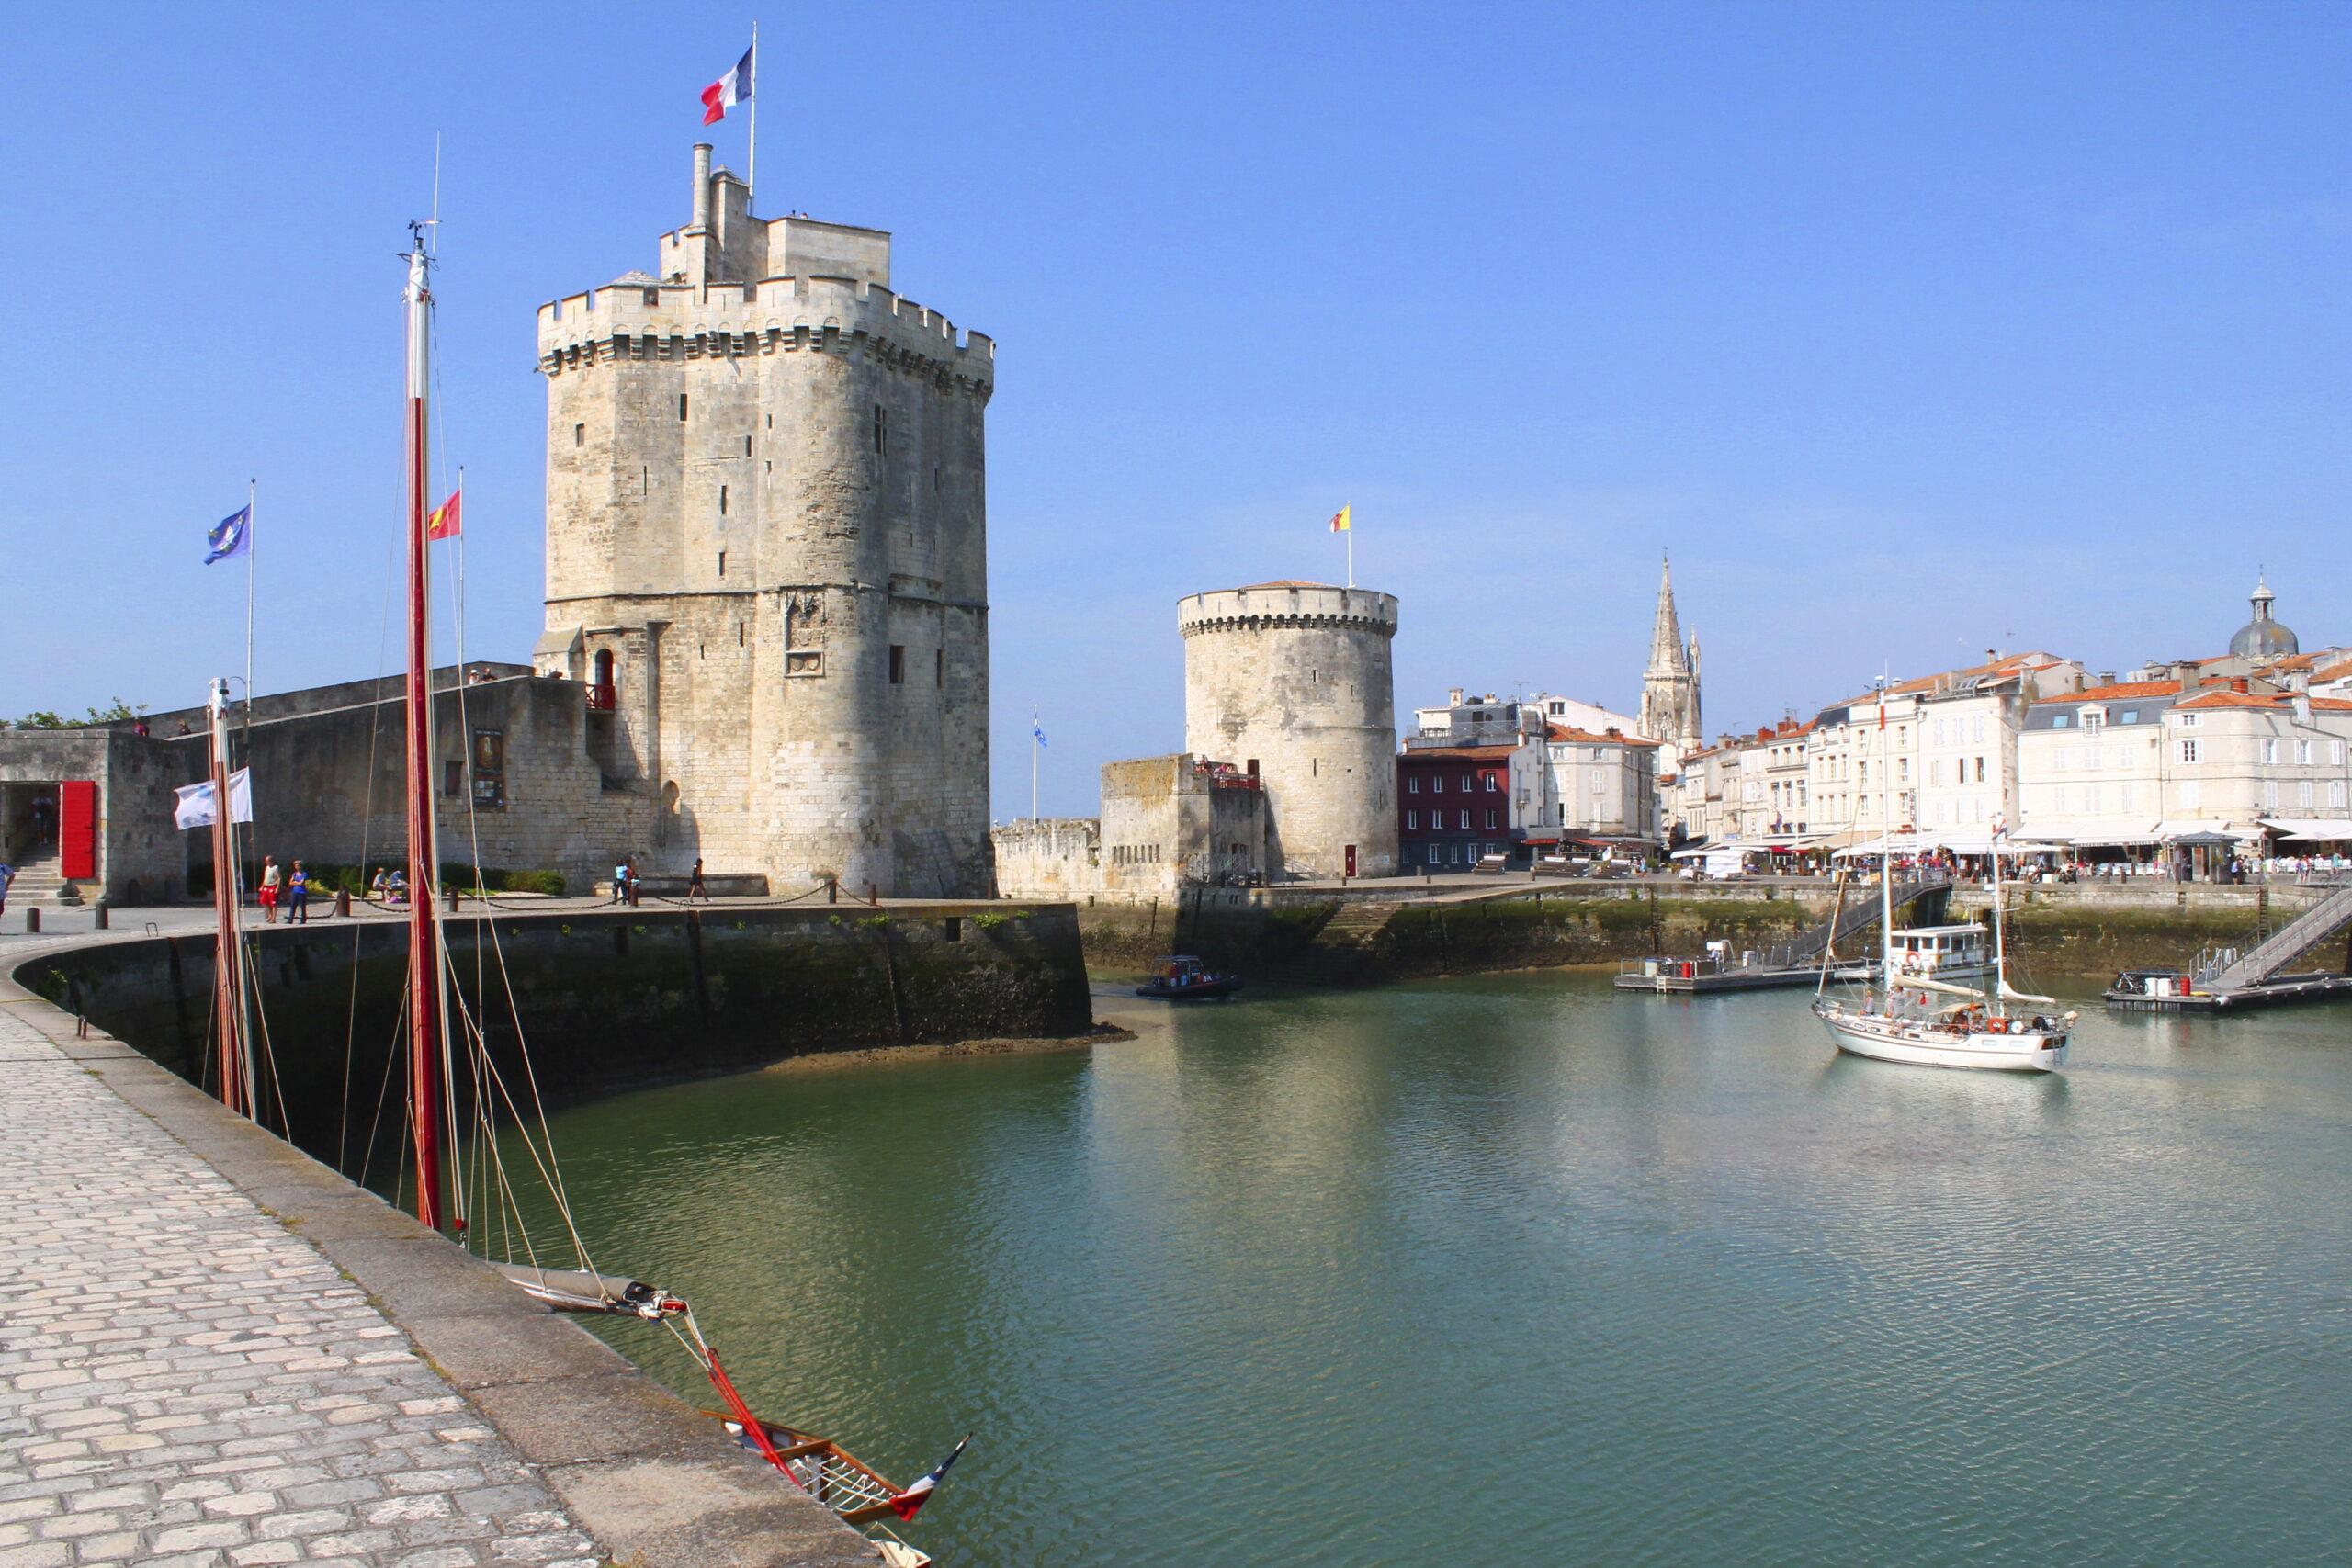 Old port of La Rochelle, France